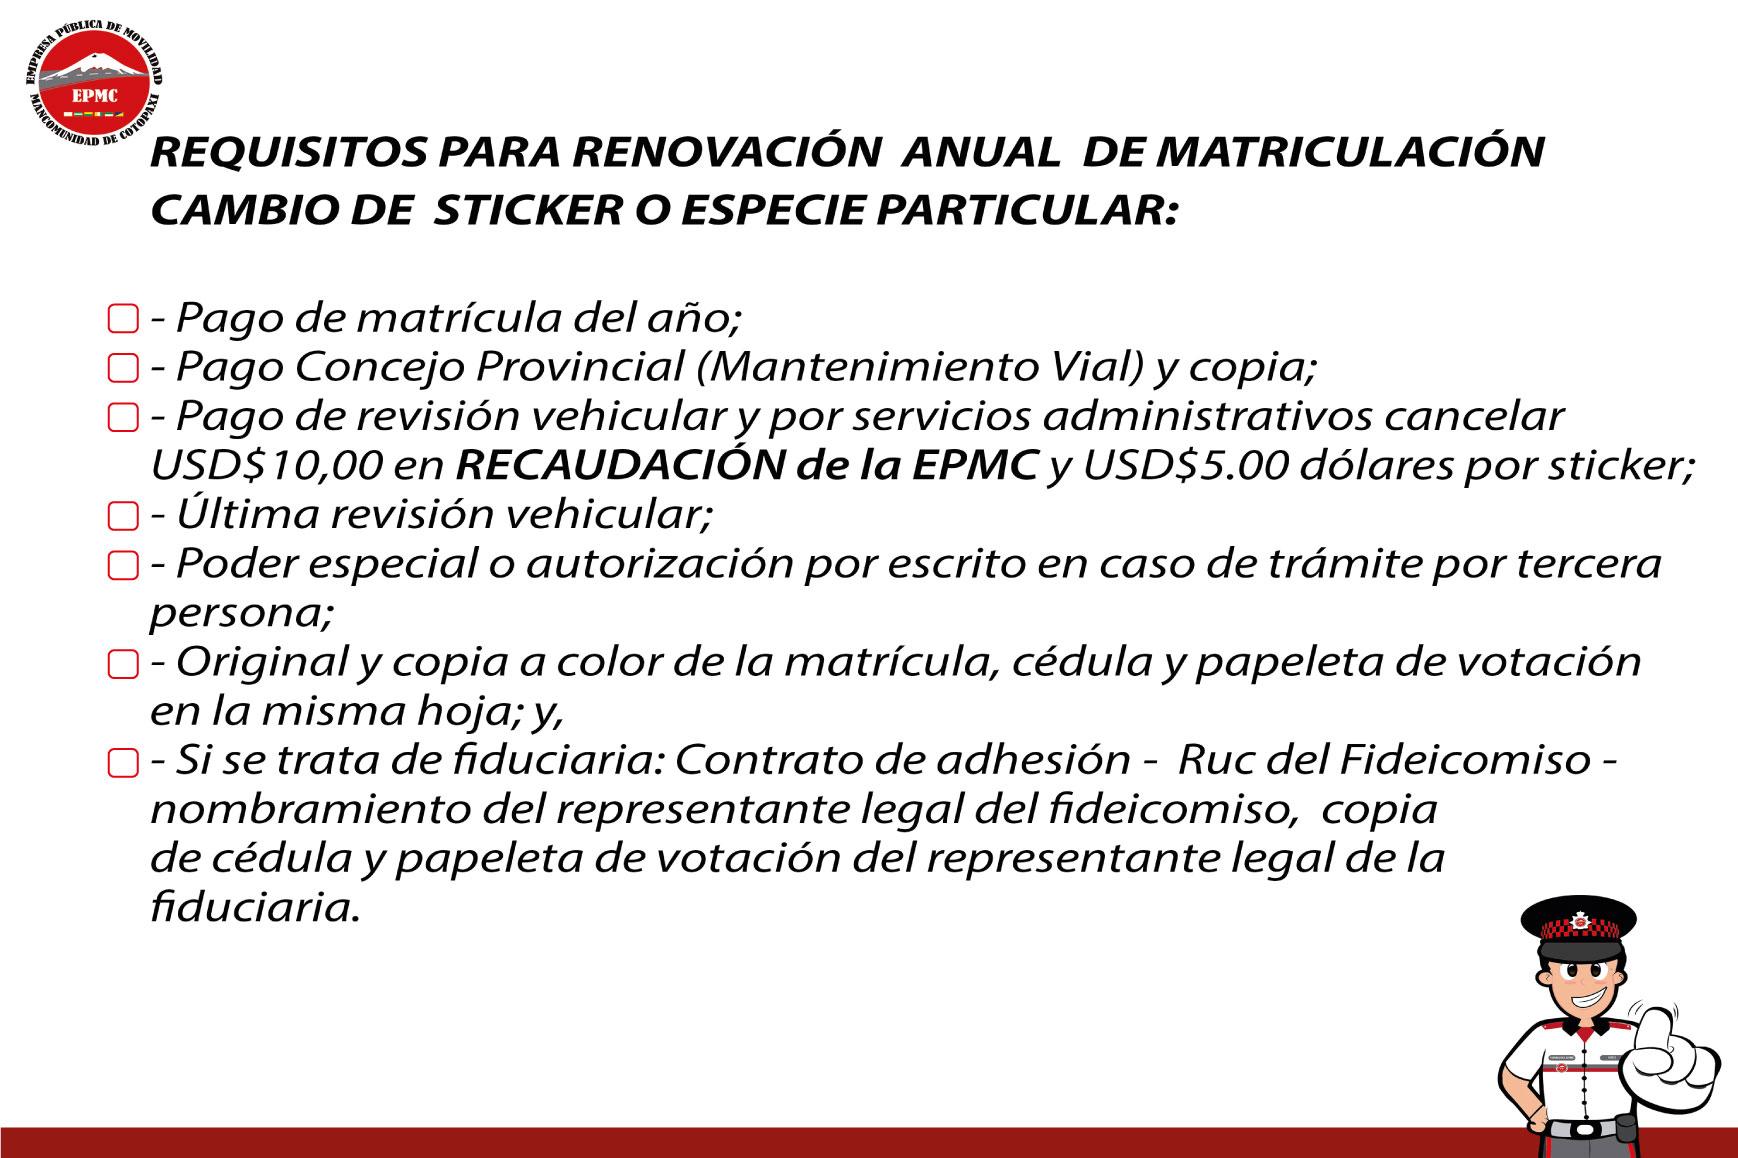 RENOVACIÓN  ANUAL  DE MATRICULACIÓN  CAMBIO DE  STICKER O ESPECIE PARTICULAR